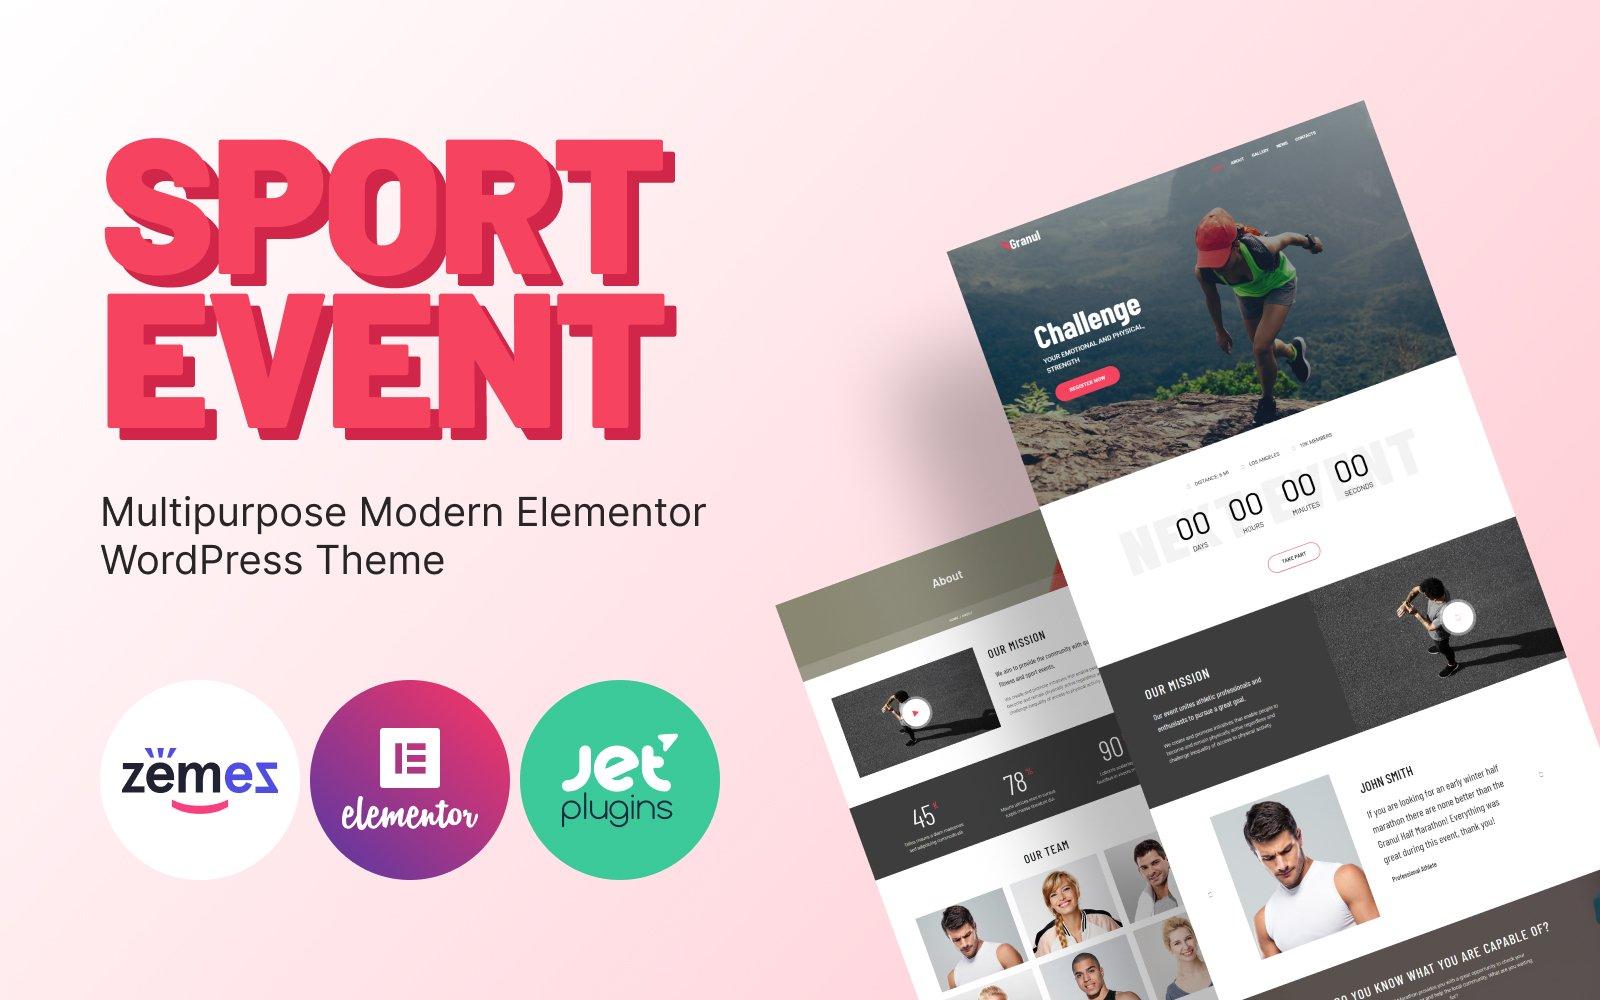 Granul - Sport Event Multipurpose Modern Elementor WordPress Theme